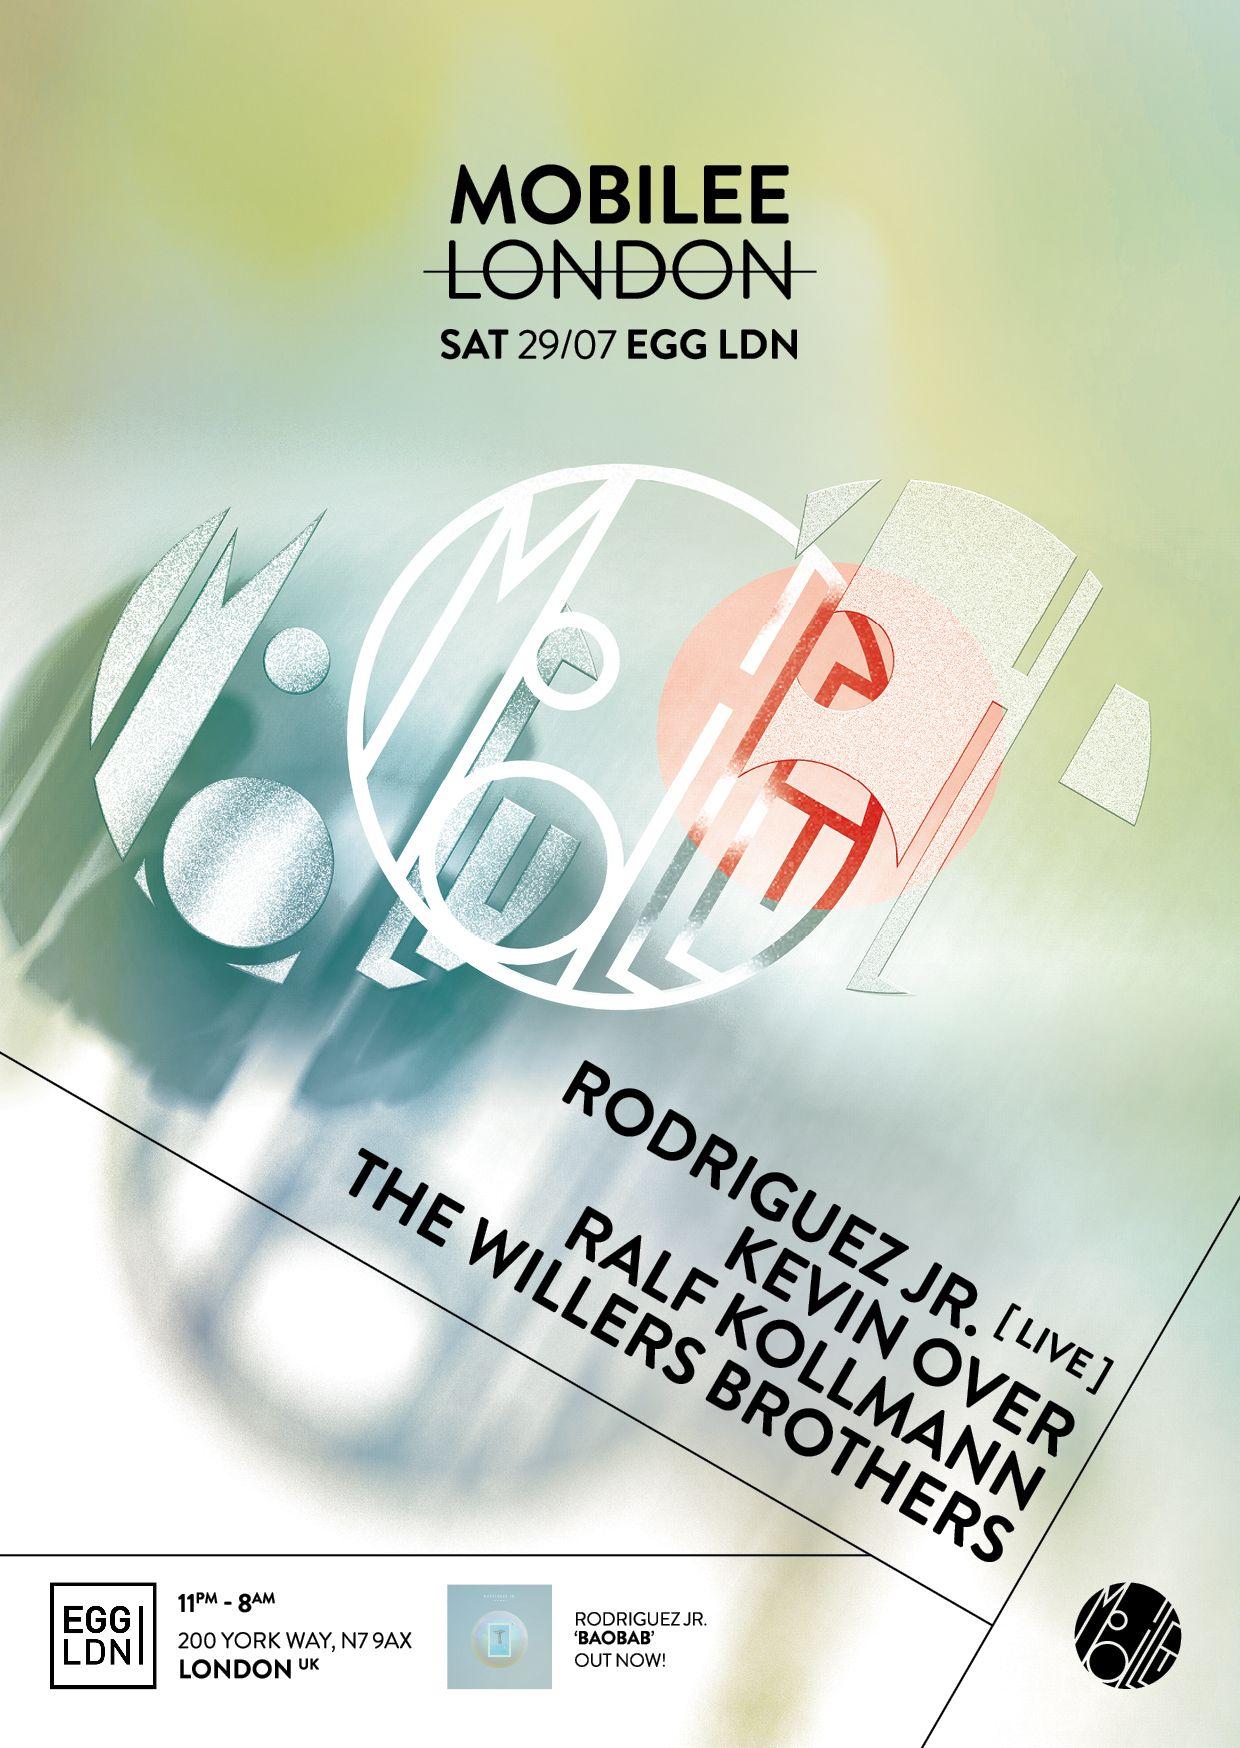 Mobilee Showcase2017 05 LONDON A6 poster